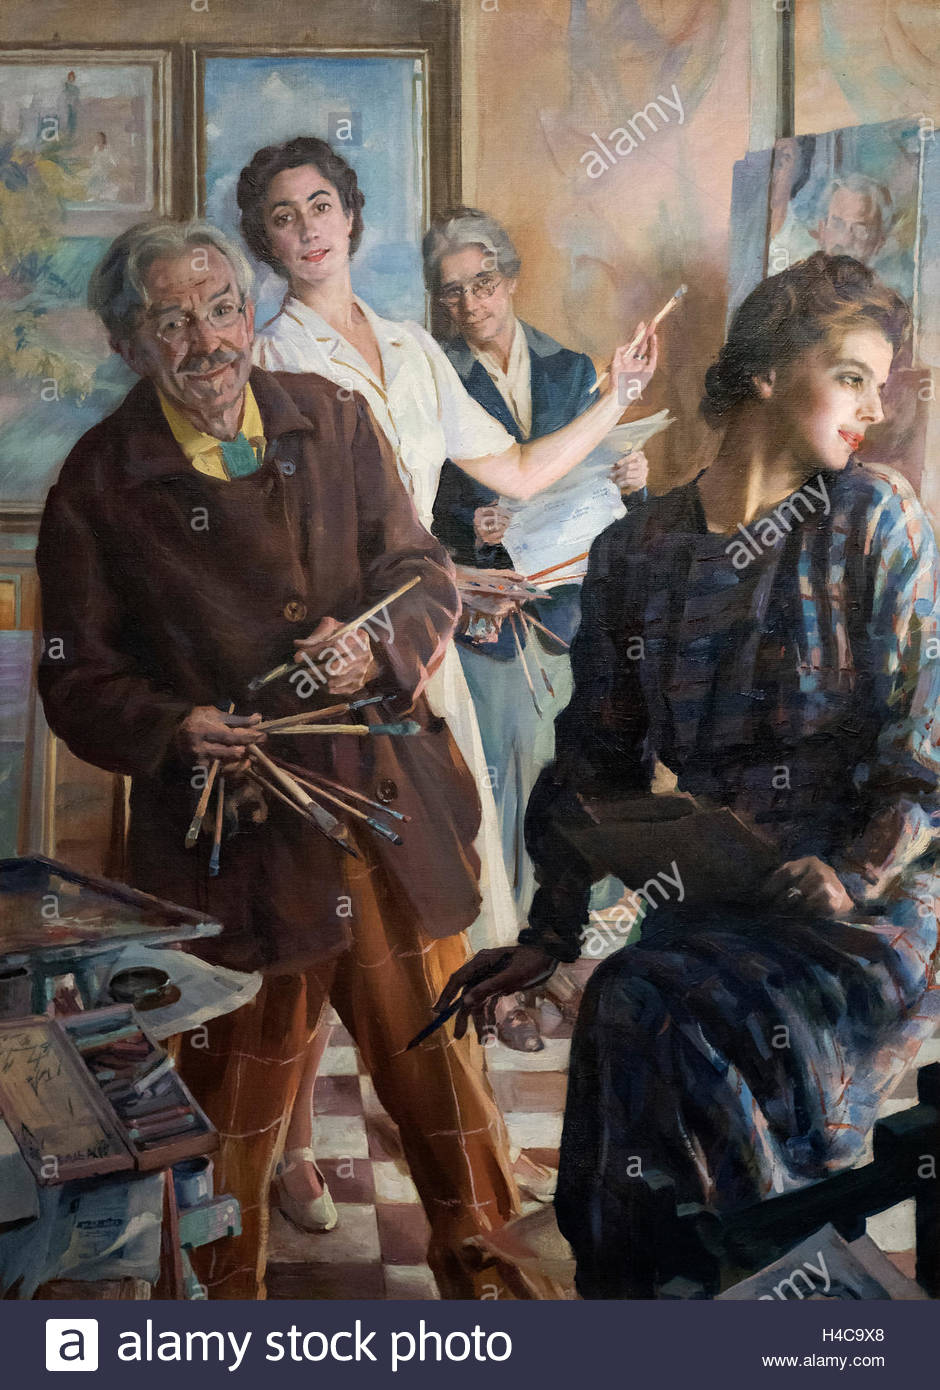 Giacomo Balla (1871-1958), Noi quattro nello spechhio, 1945. Four of us in the mirror. - Stock Image